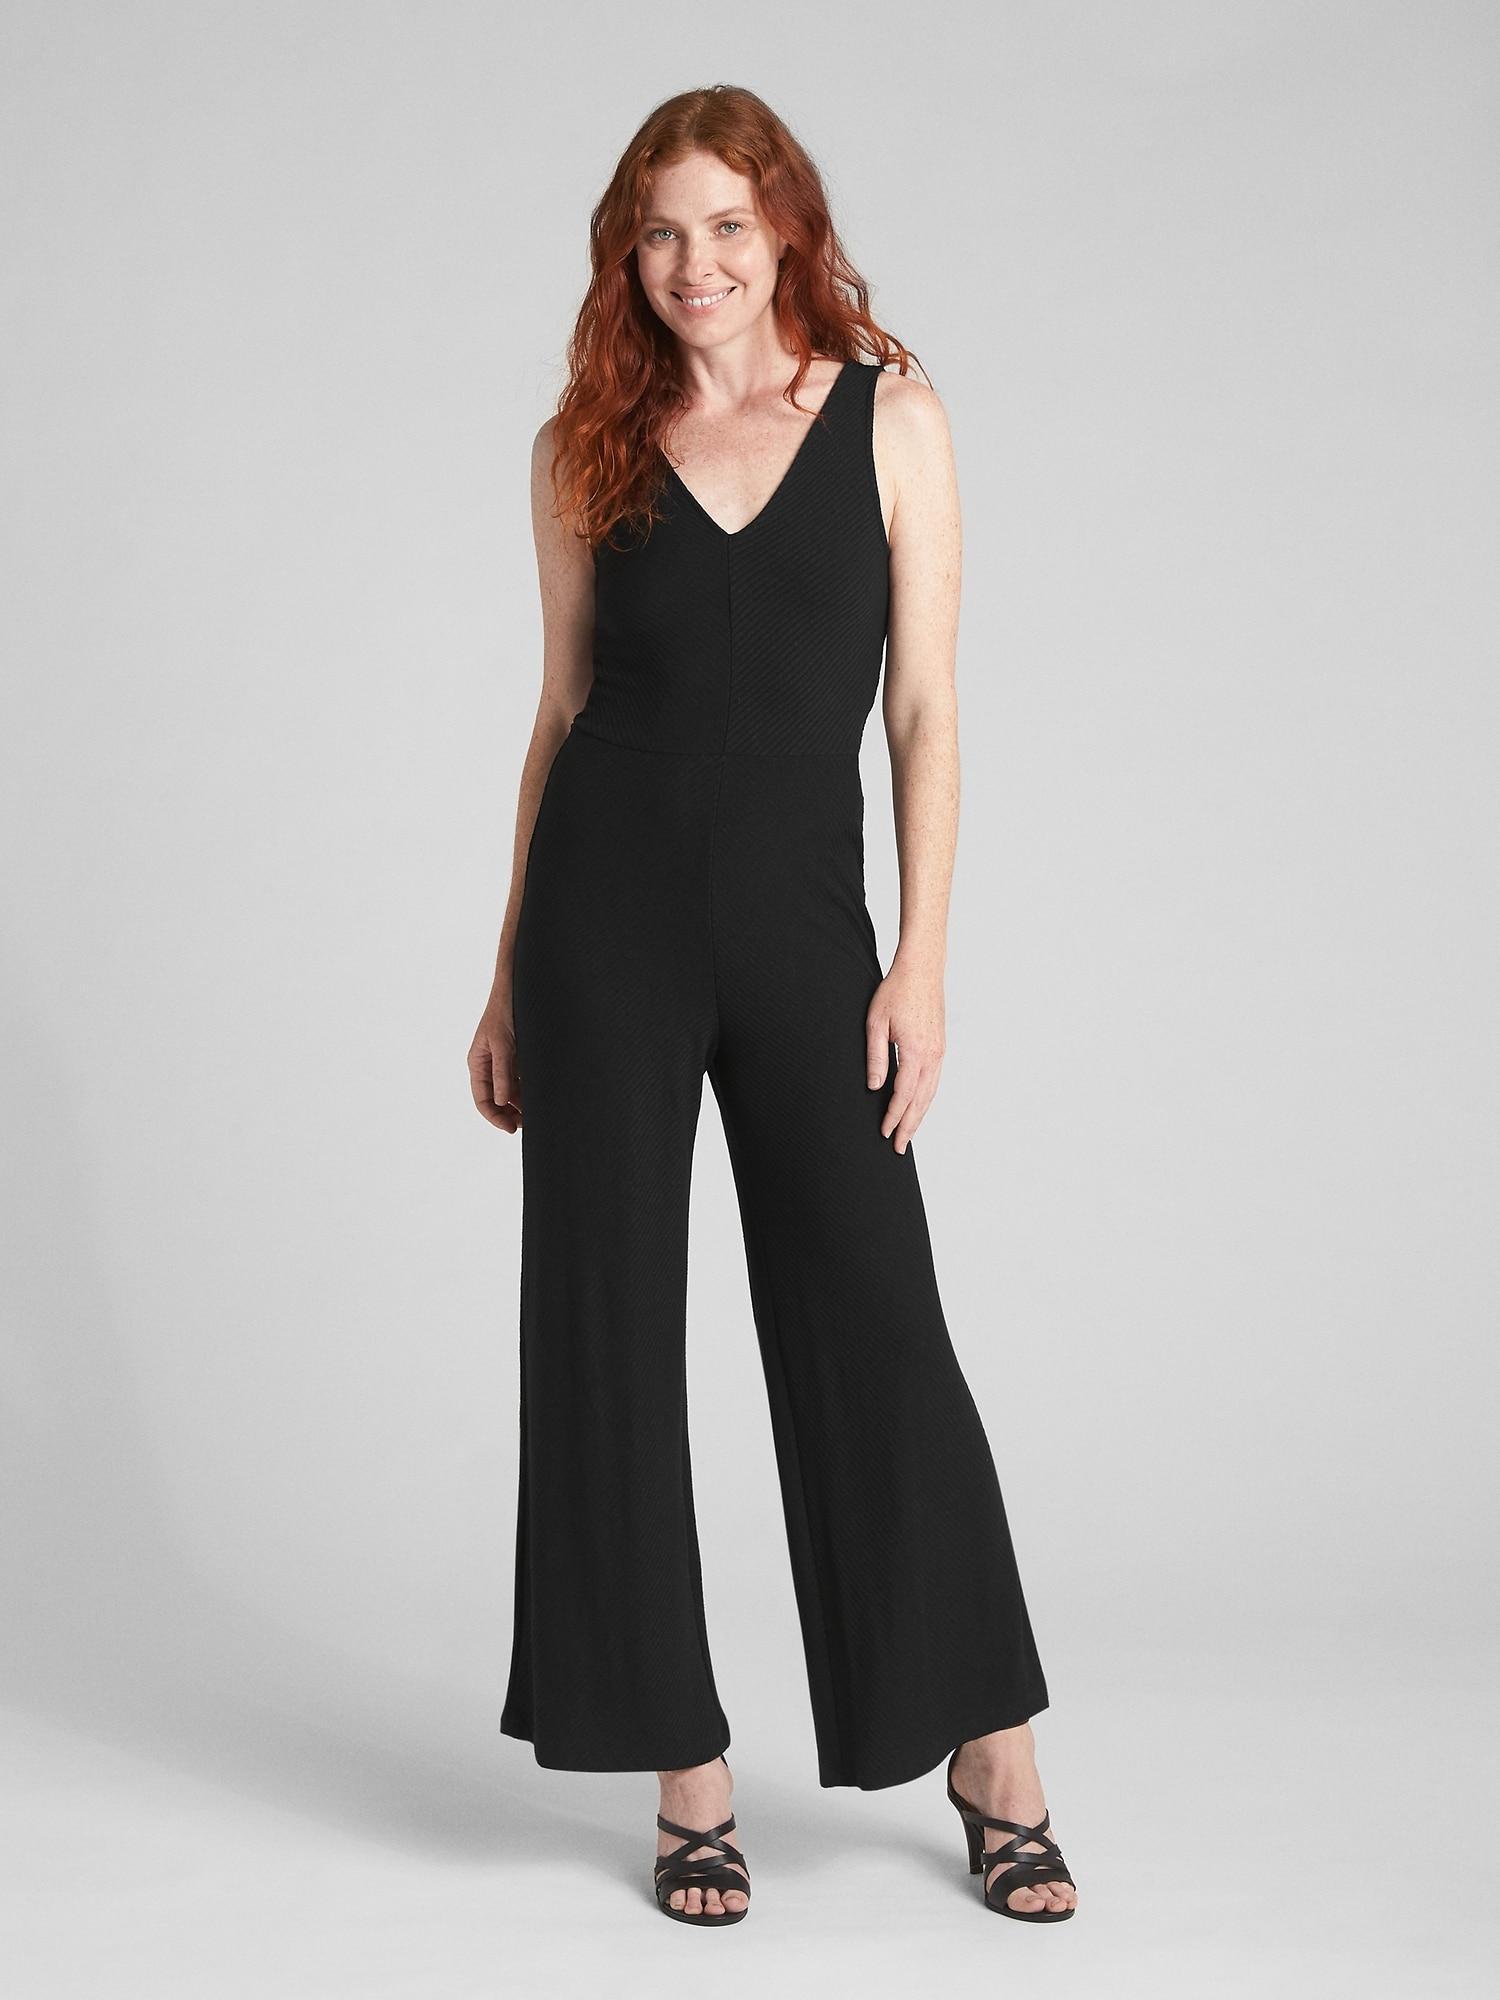 de2caca3bb2 Lyst - Gap Softspun Sleeveless V-neck Jumpsuit in Black